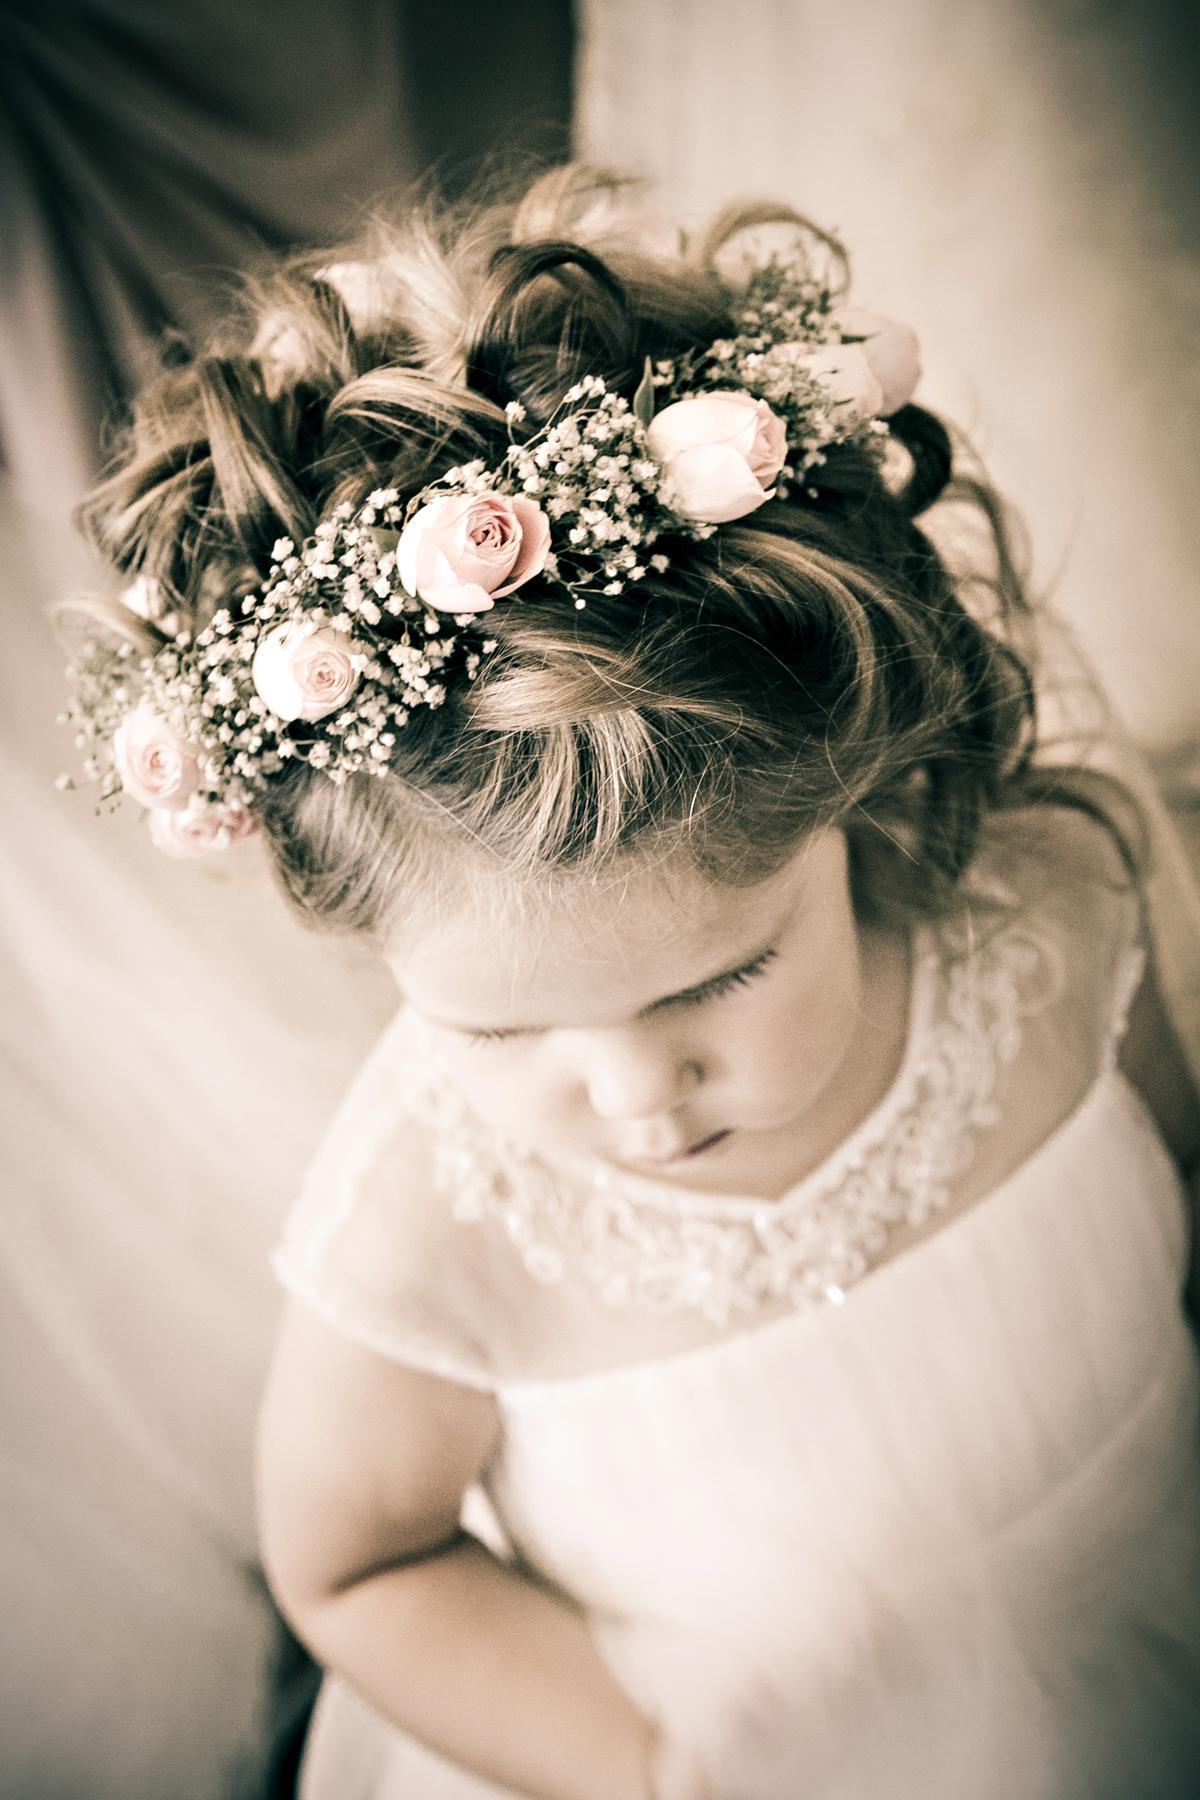 tim otto wedding photography